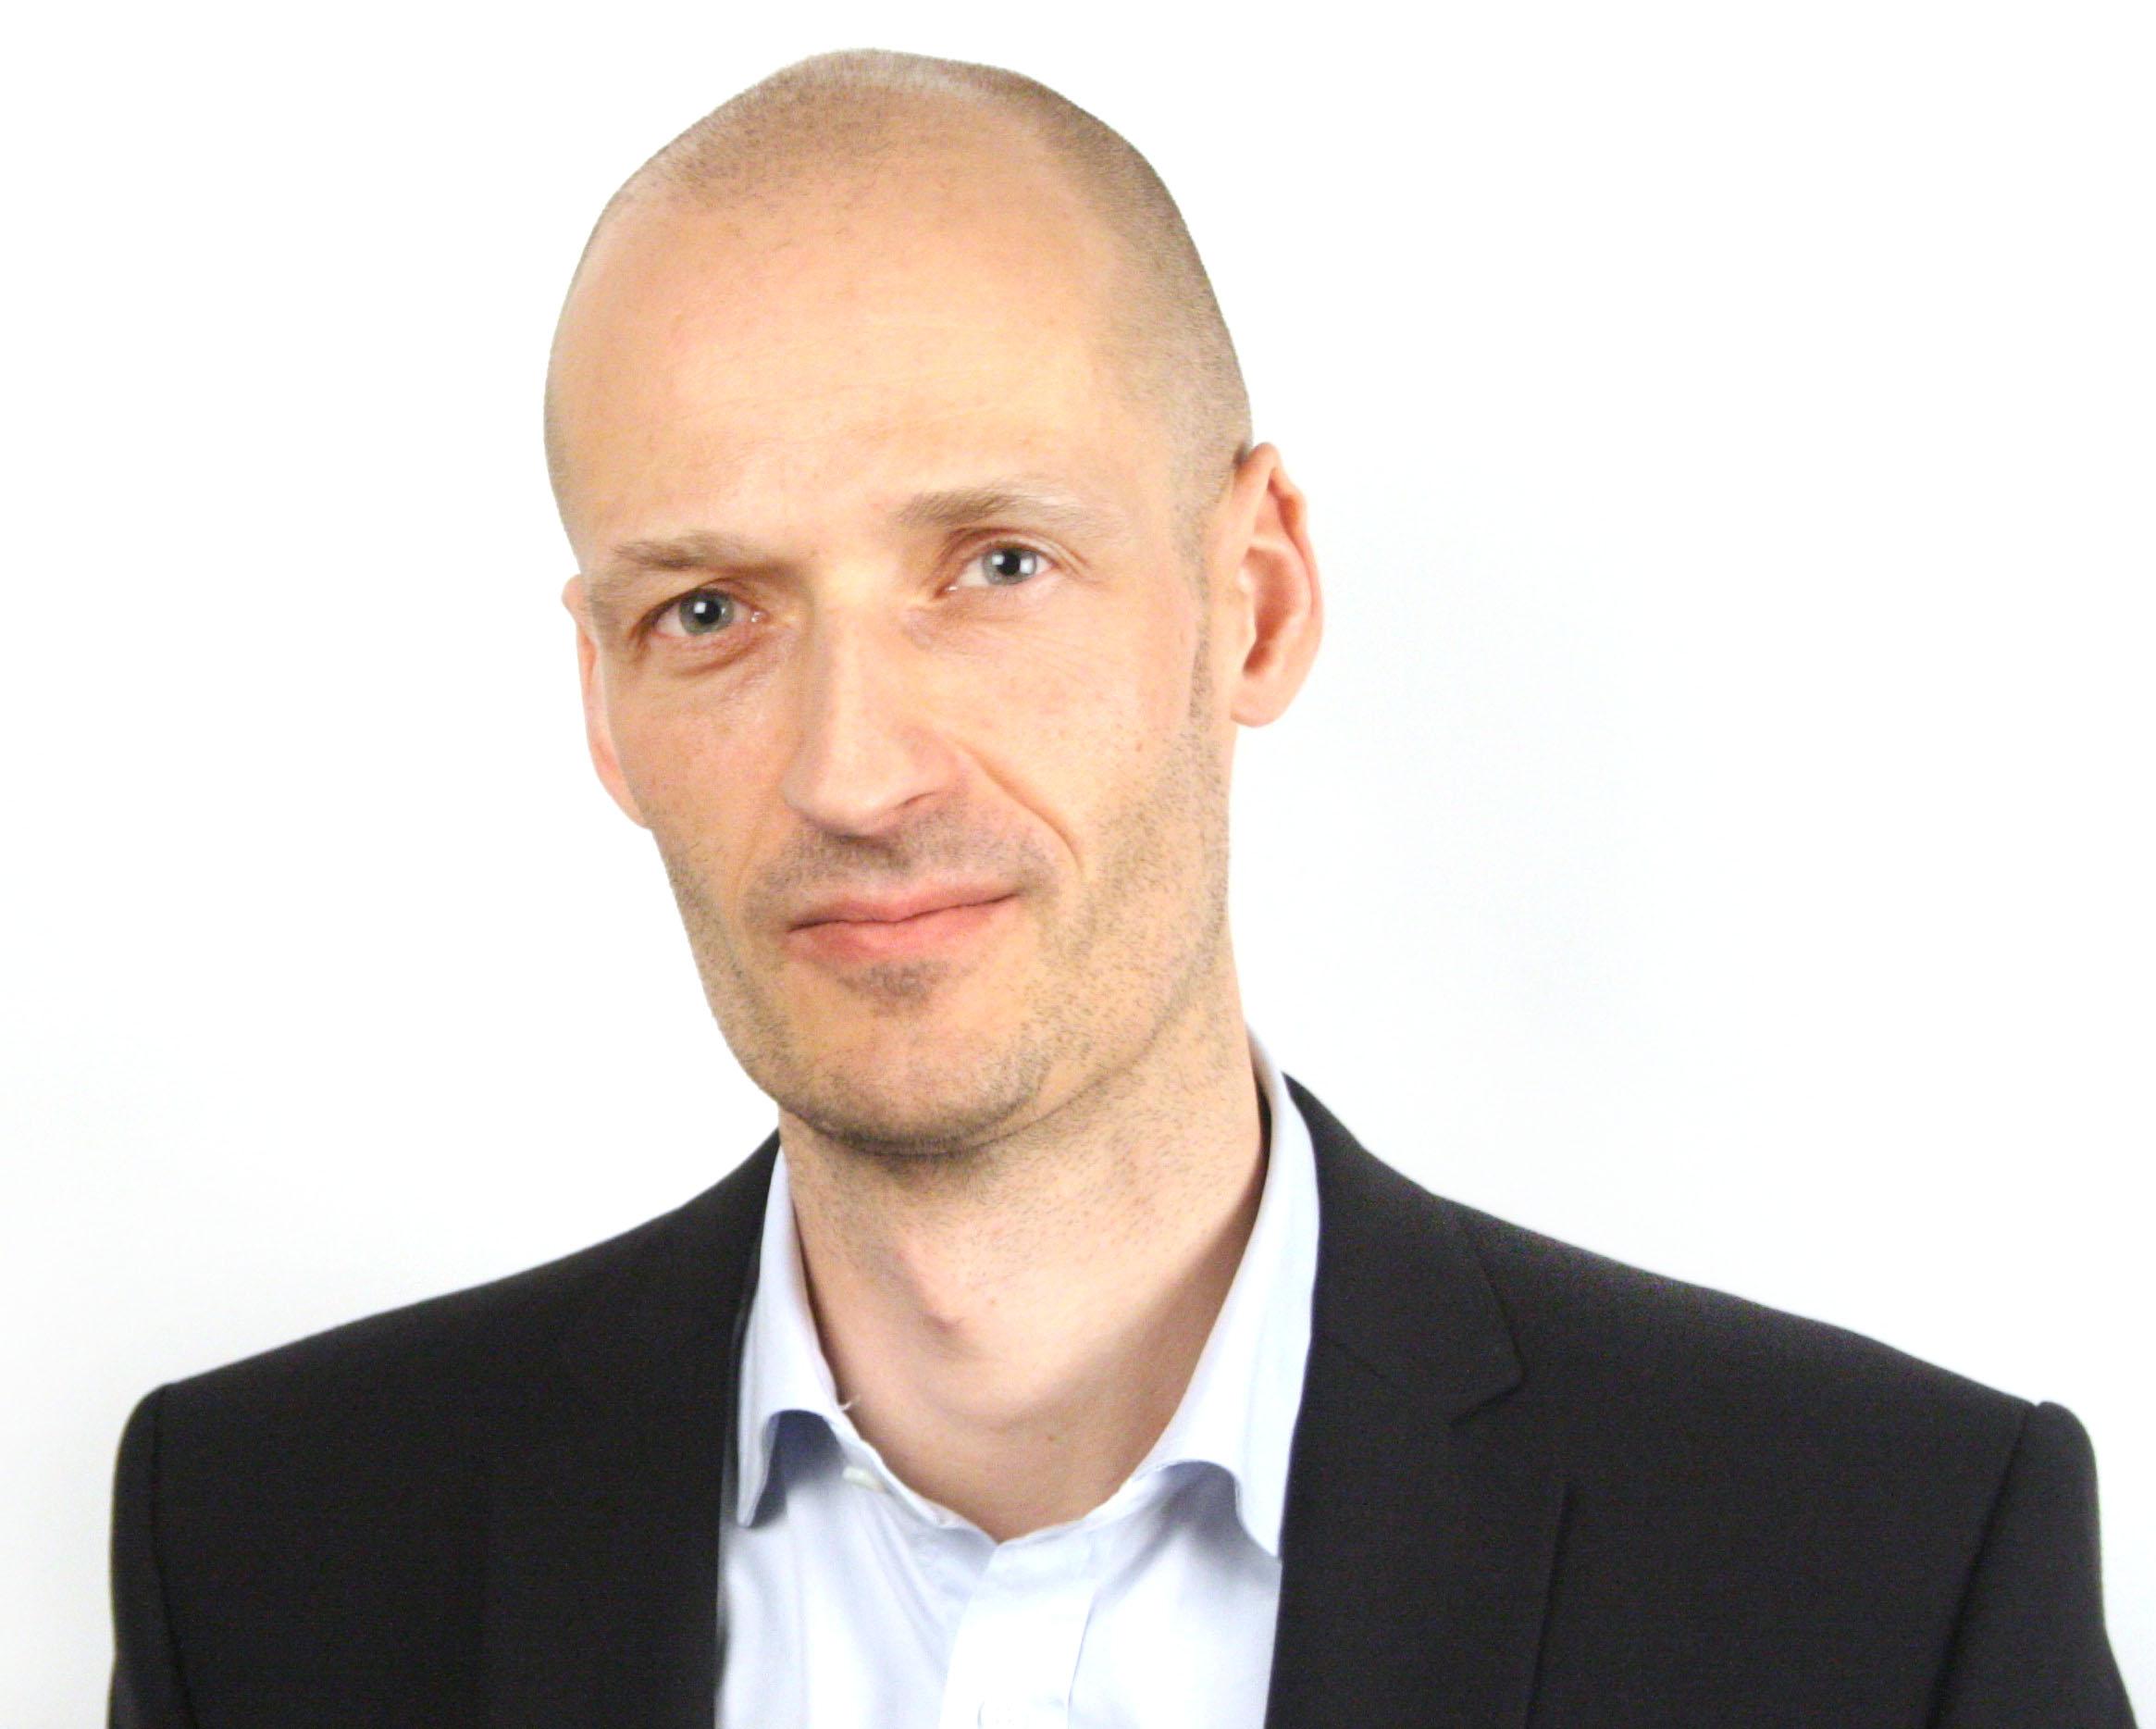 Alexander Smidt Olsen